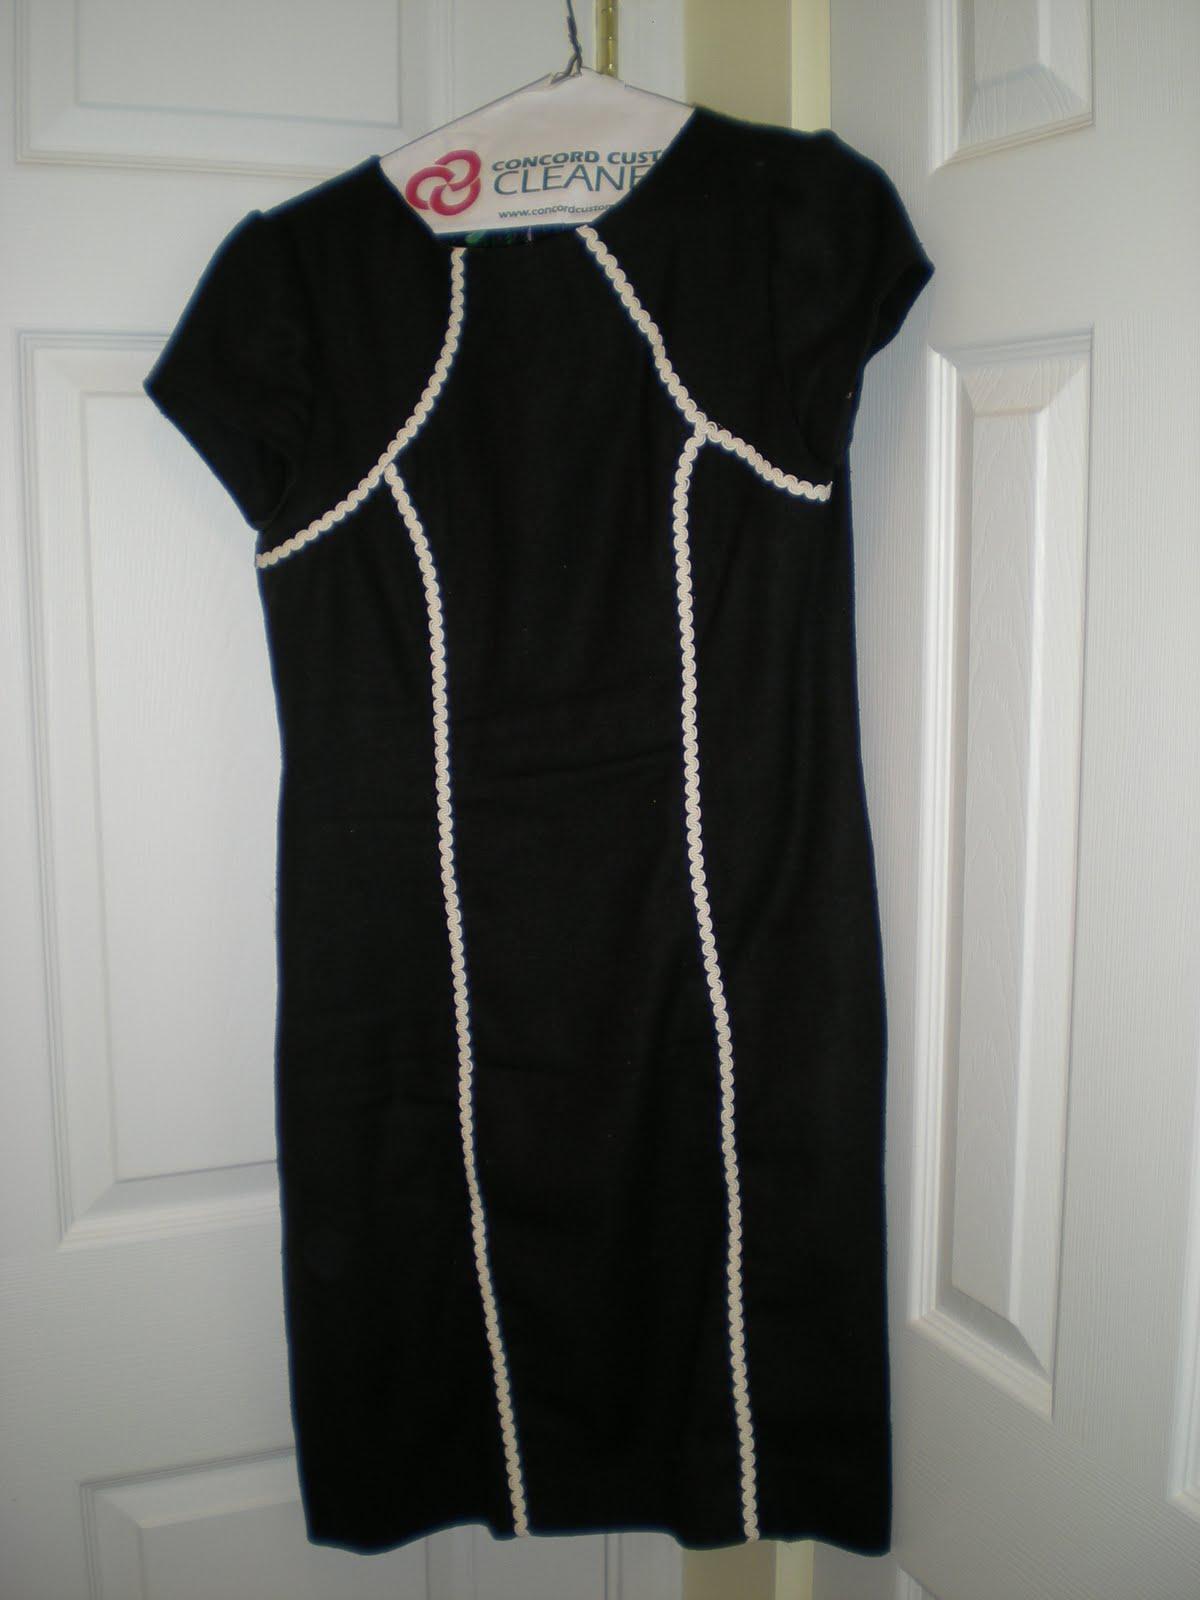 Black Funeral Dresses I'll start with a dress i Images ...